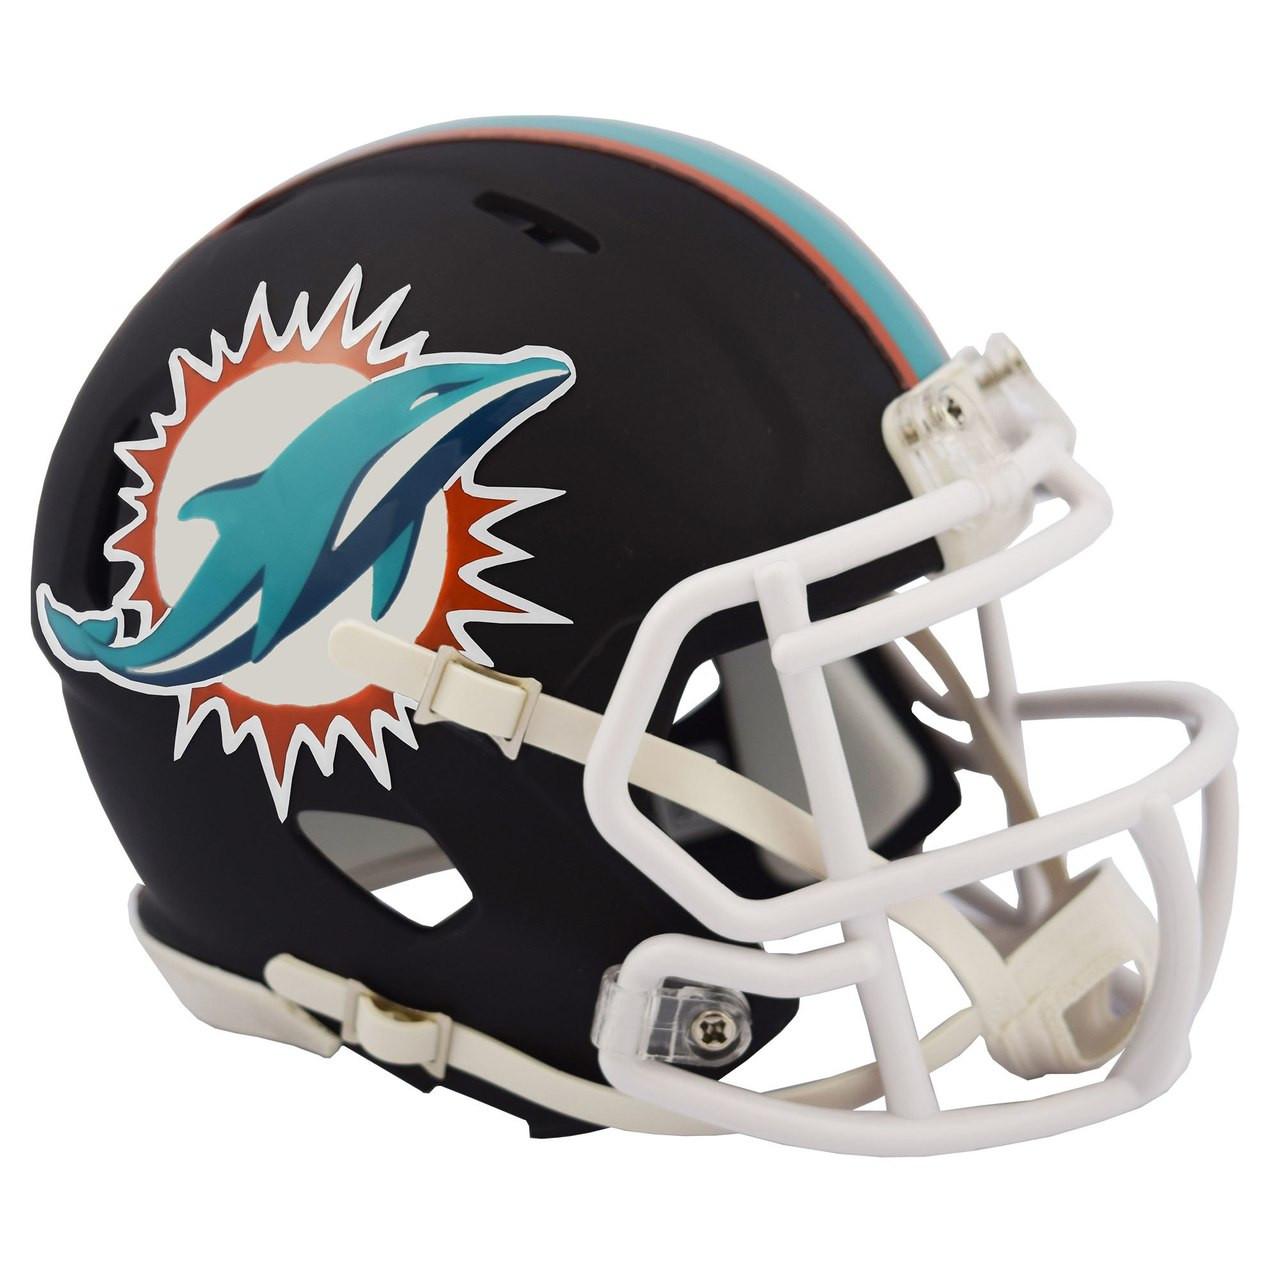 945ff913 Riddell Miami Dolphins Black Matte Alternate Speed Mini Football Helmet